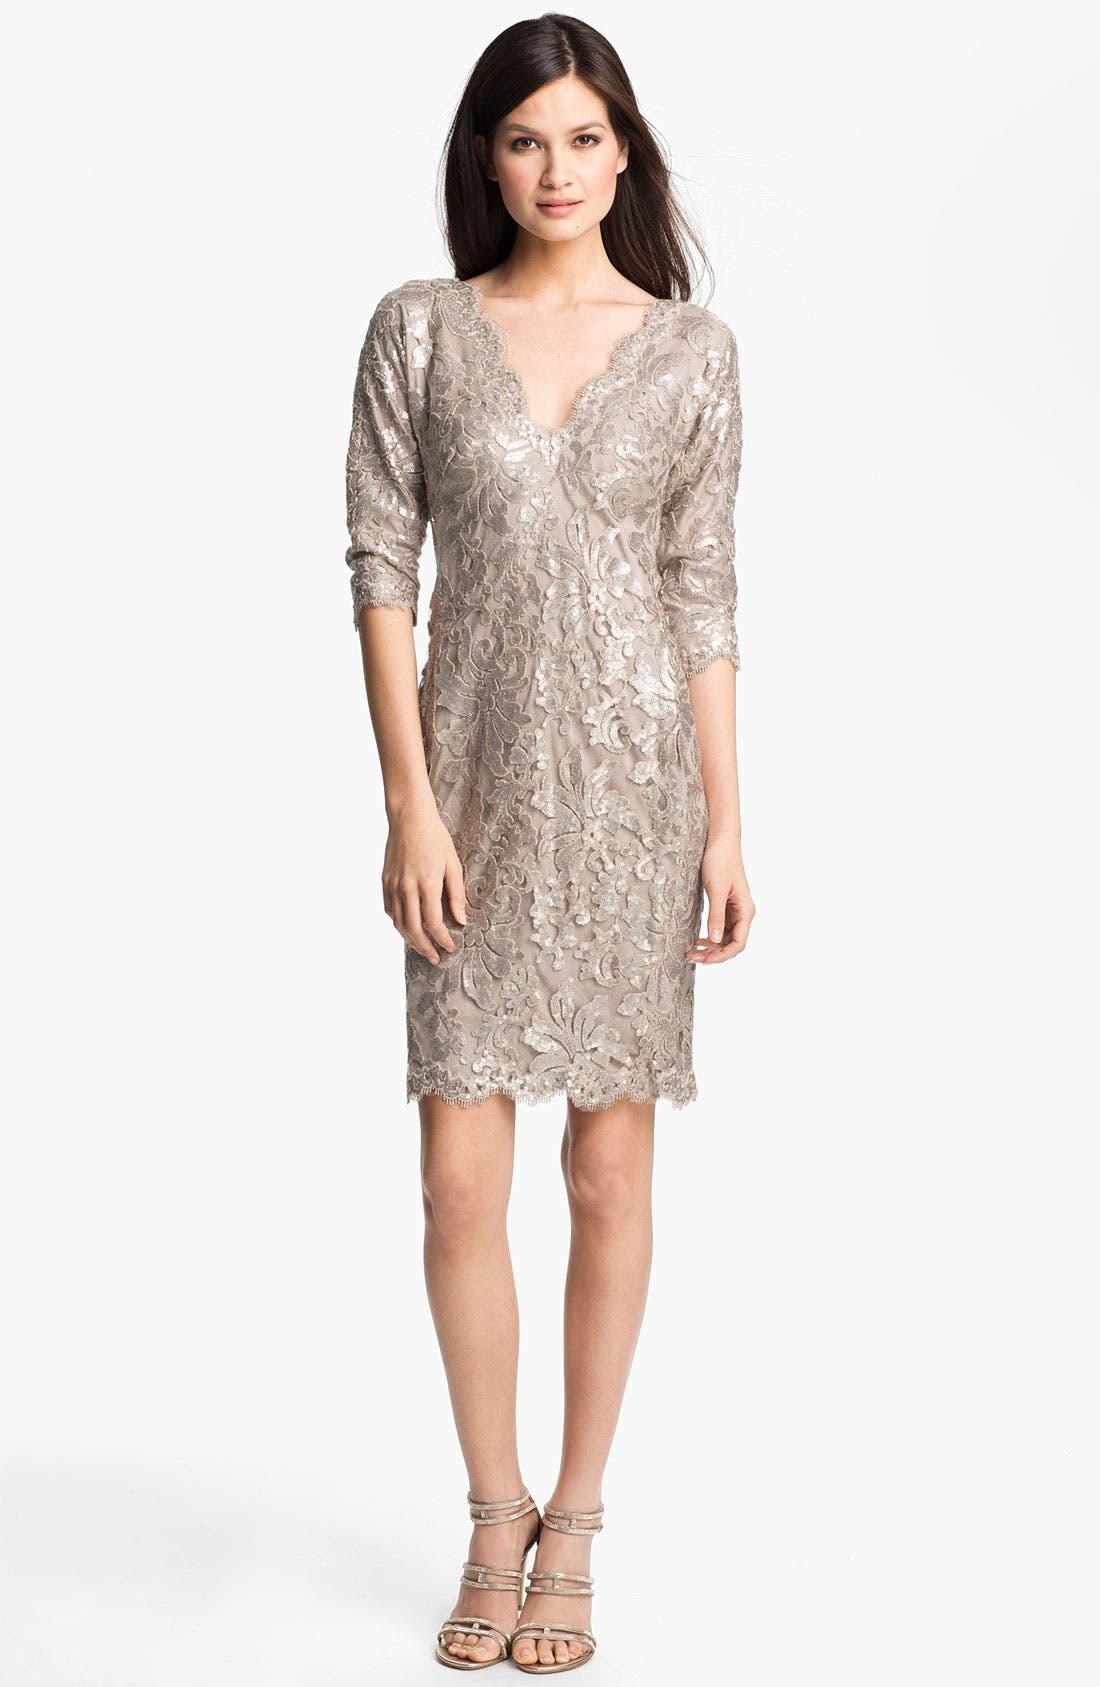 Alternate Image 1 Selected - Tadashi Shoji Sequin Lace Dress